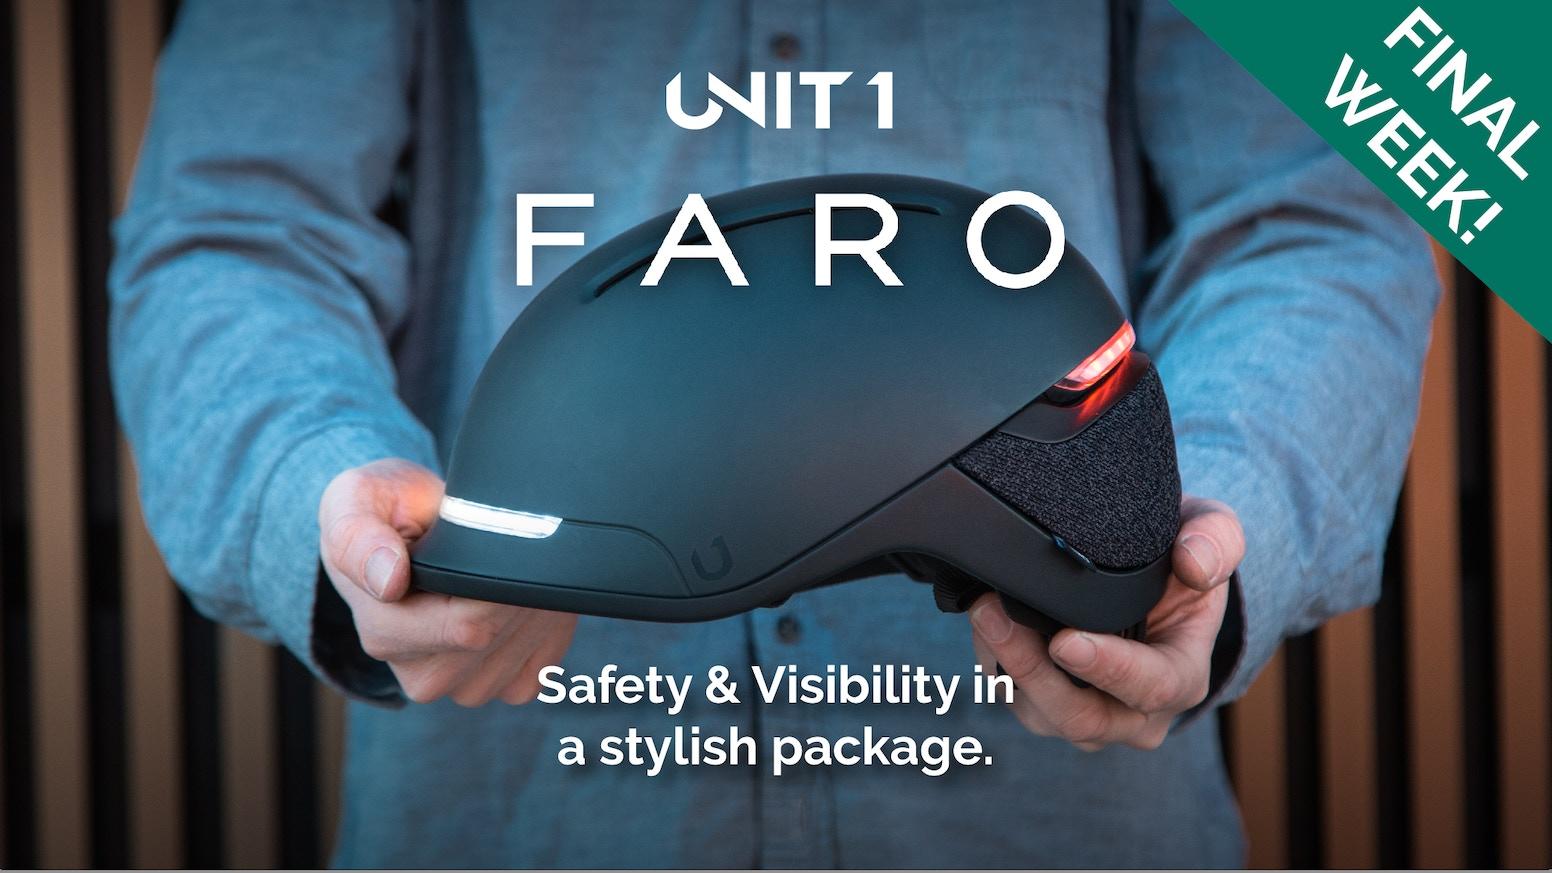 FARO by UNIT 1: A Sleek, Visibility-First Smart Helmet